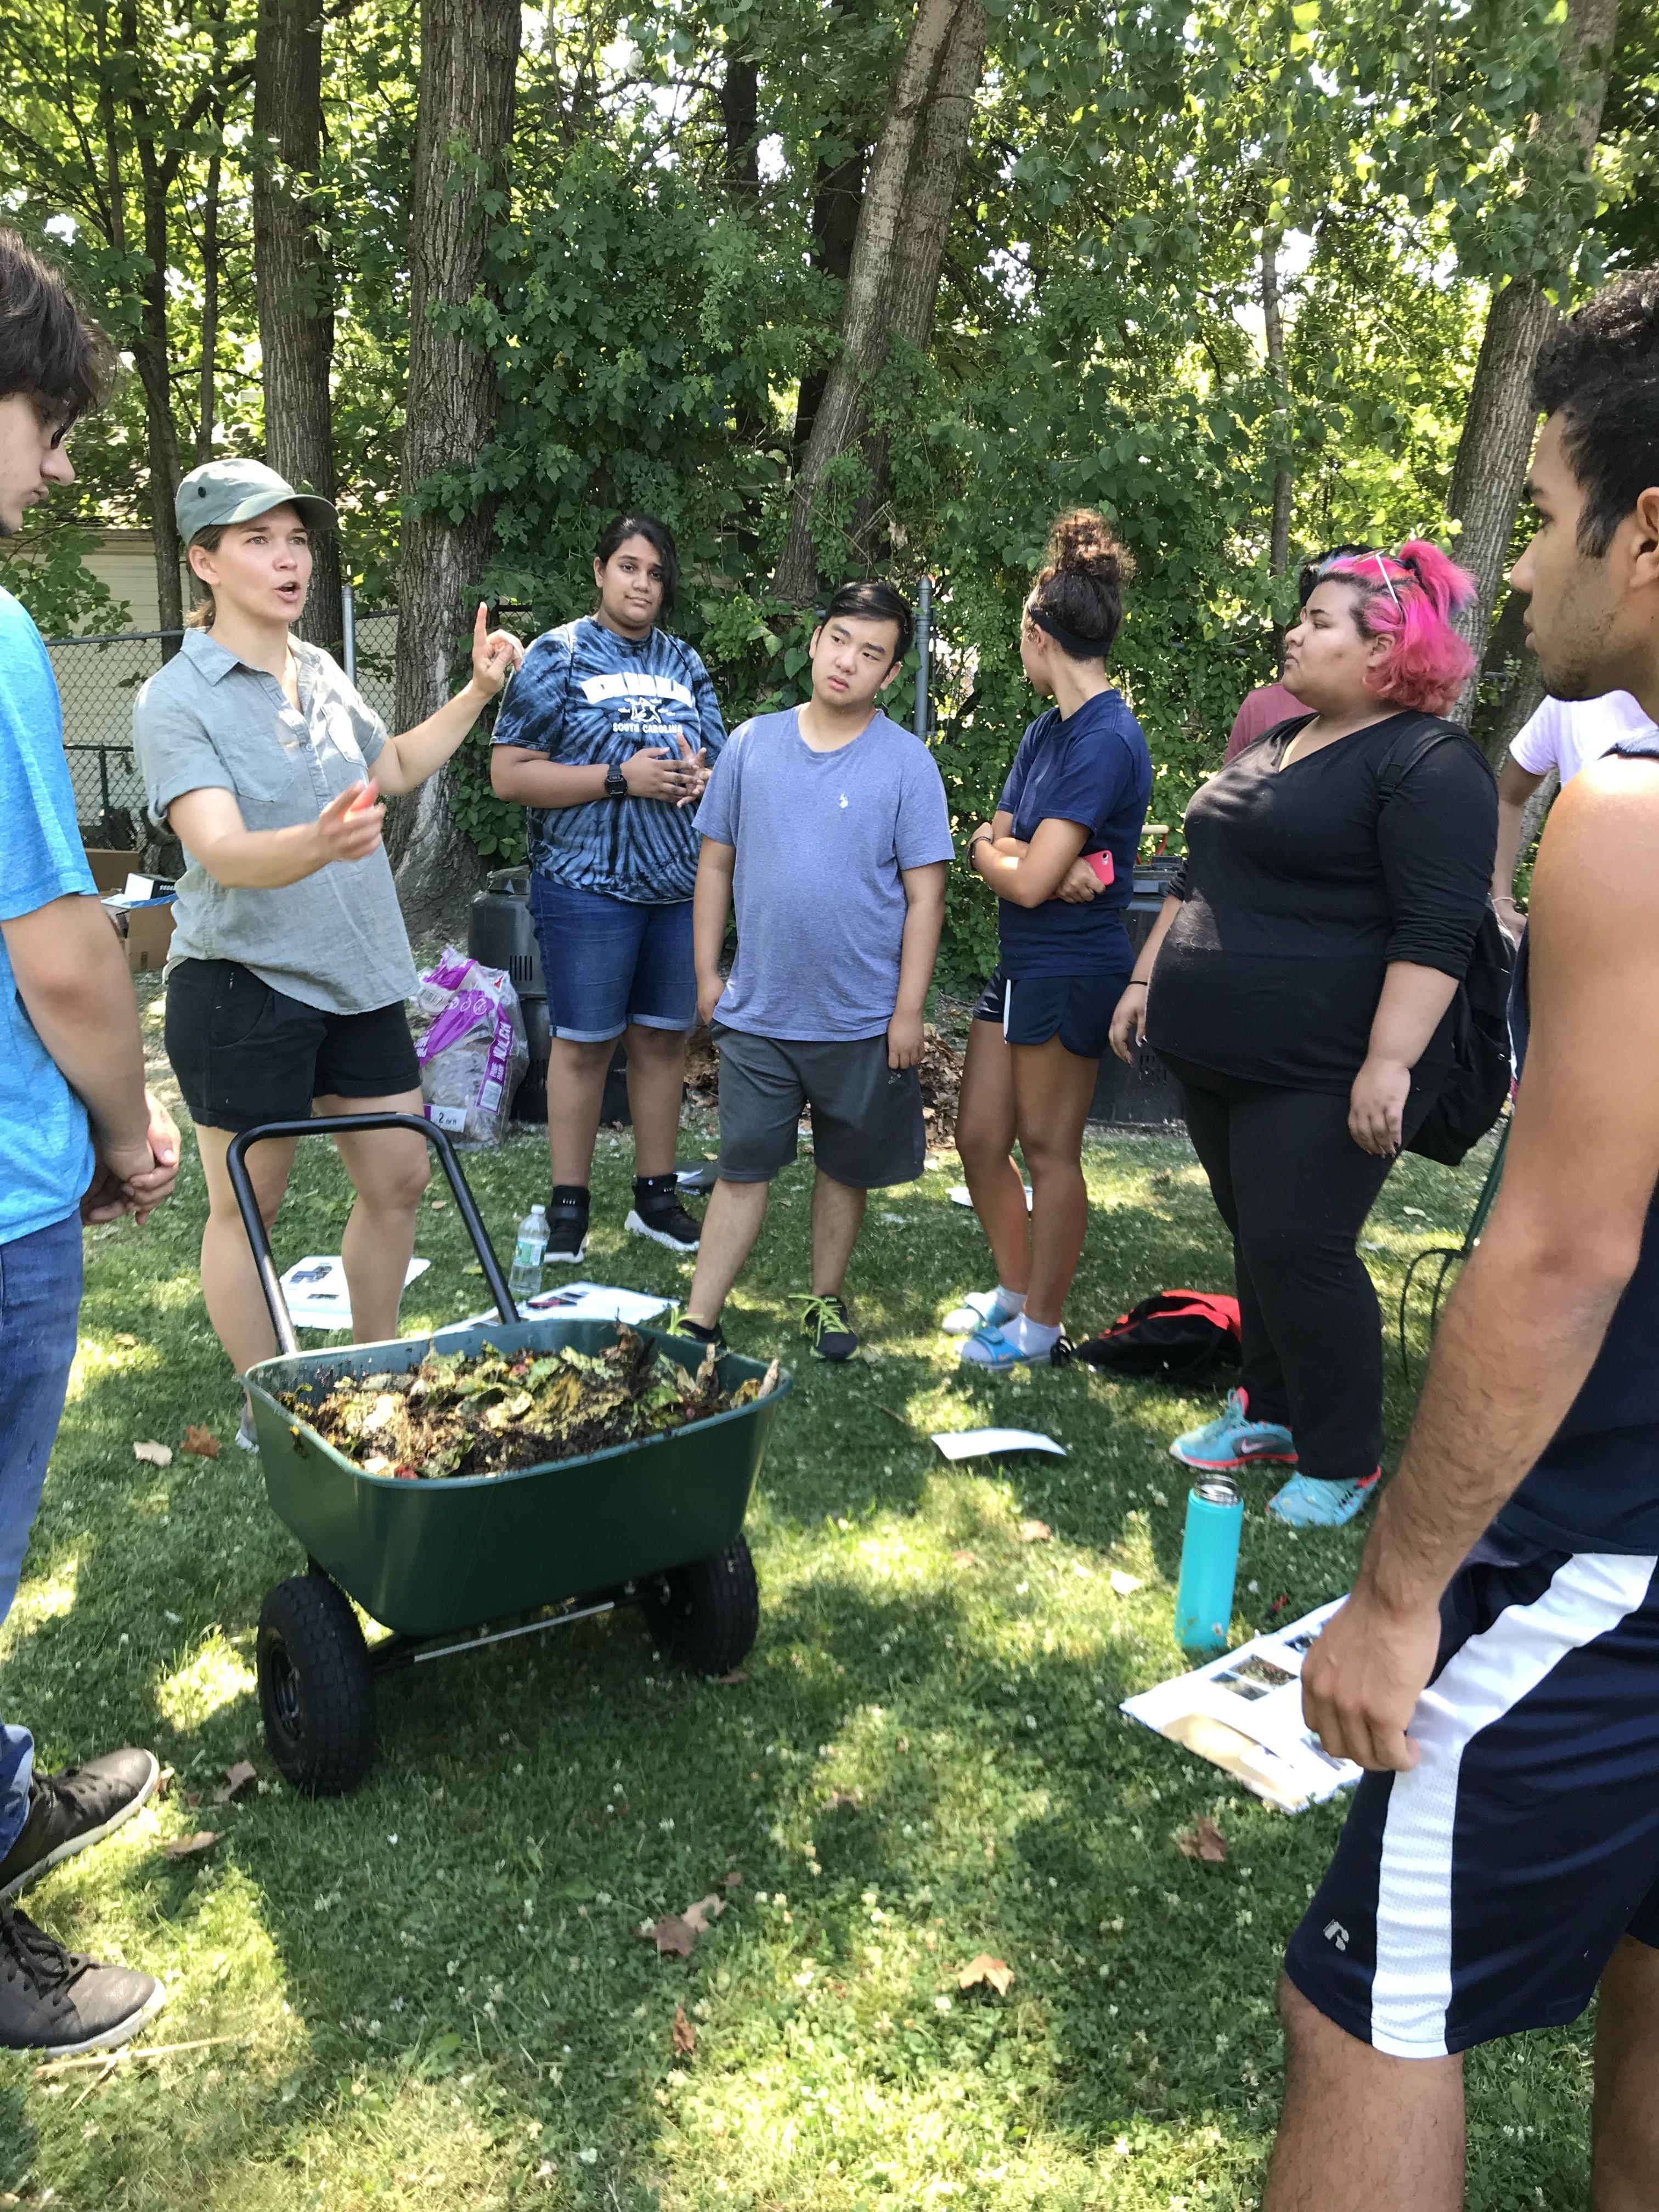 ILSR's Linda Bilsens Brolis works with participants to explore different compost recipes.